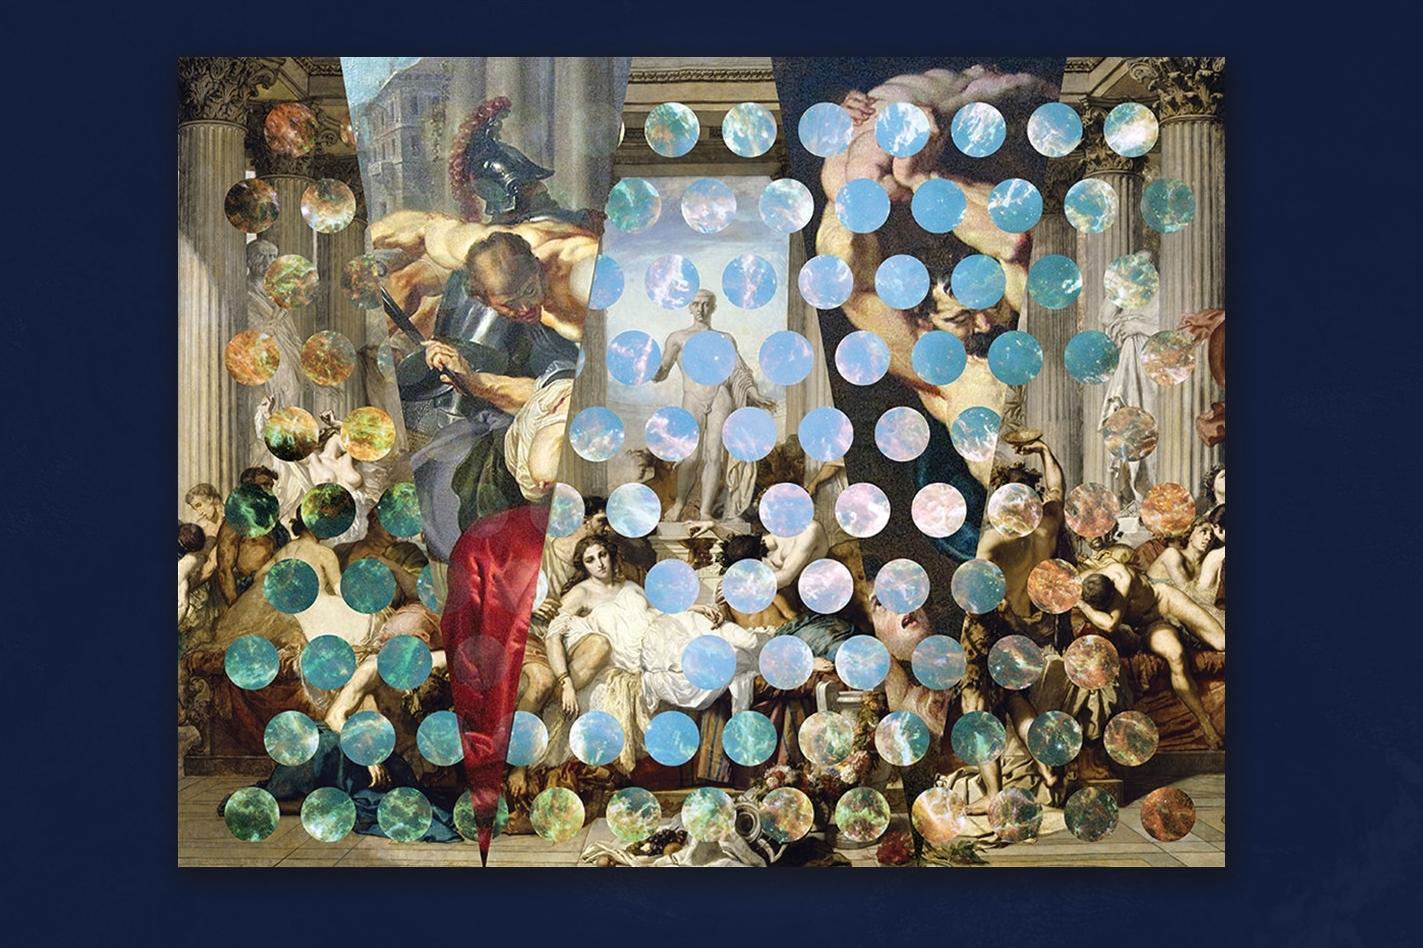 Innocents I by Joseph Malfettone The Transfiguration.jpg